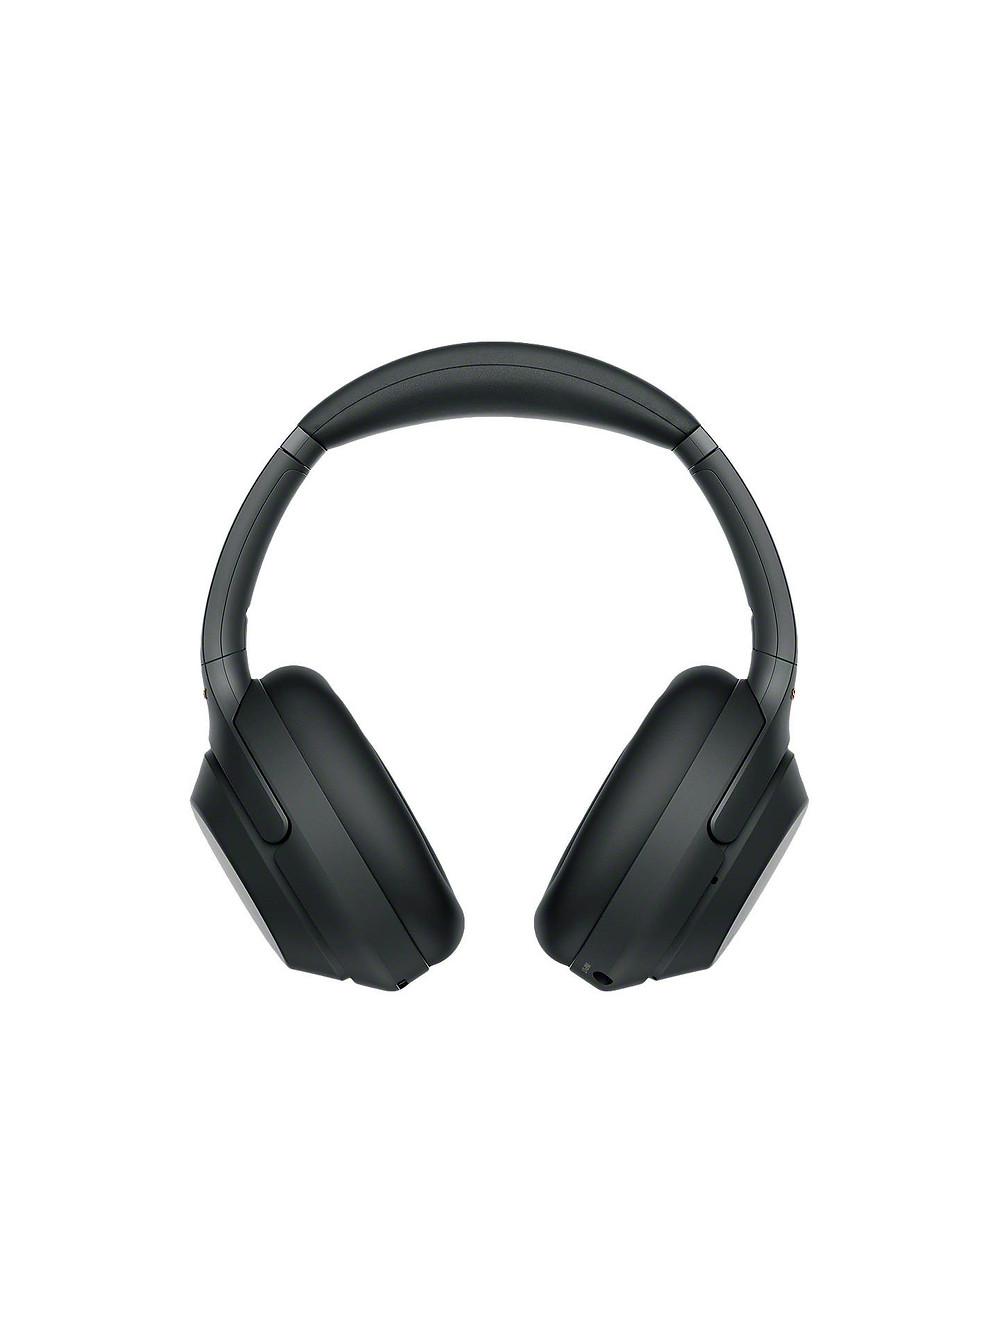 Valentine's Day gift idea for him: Sony wireless bluetooth headphone